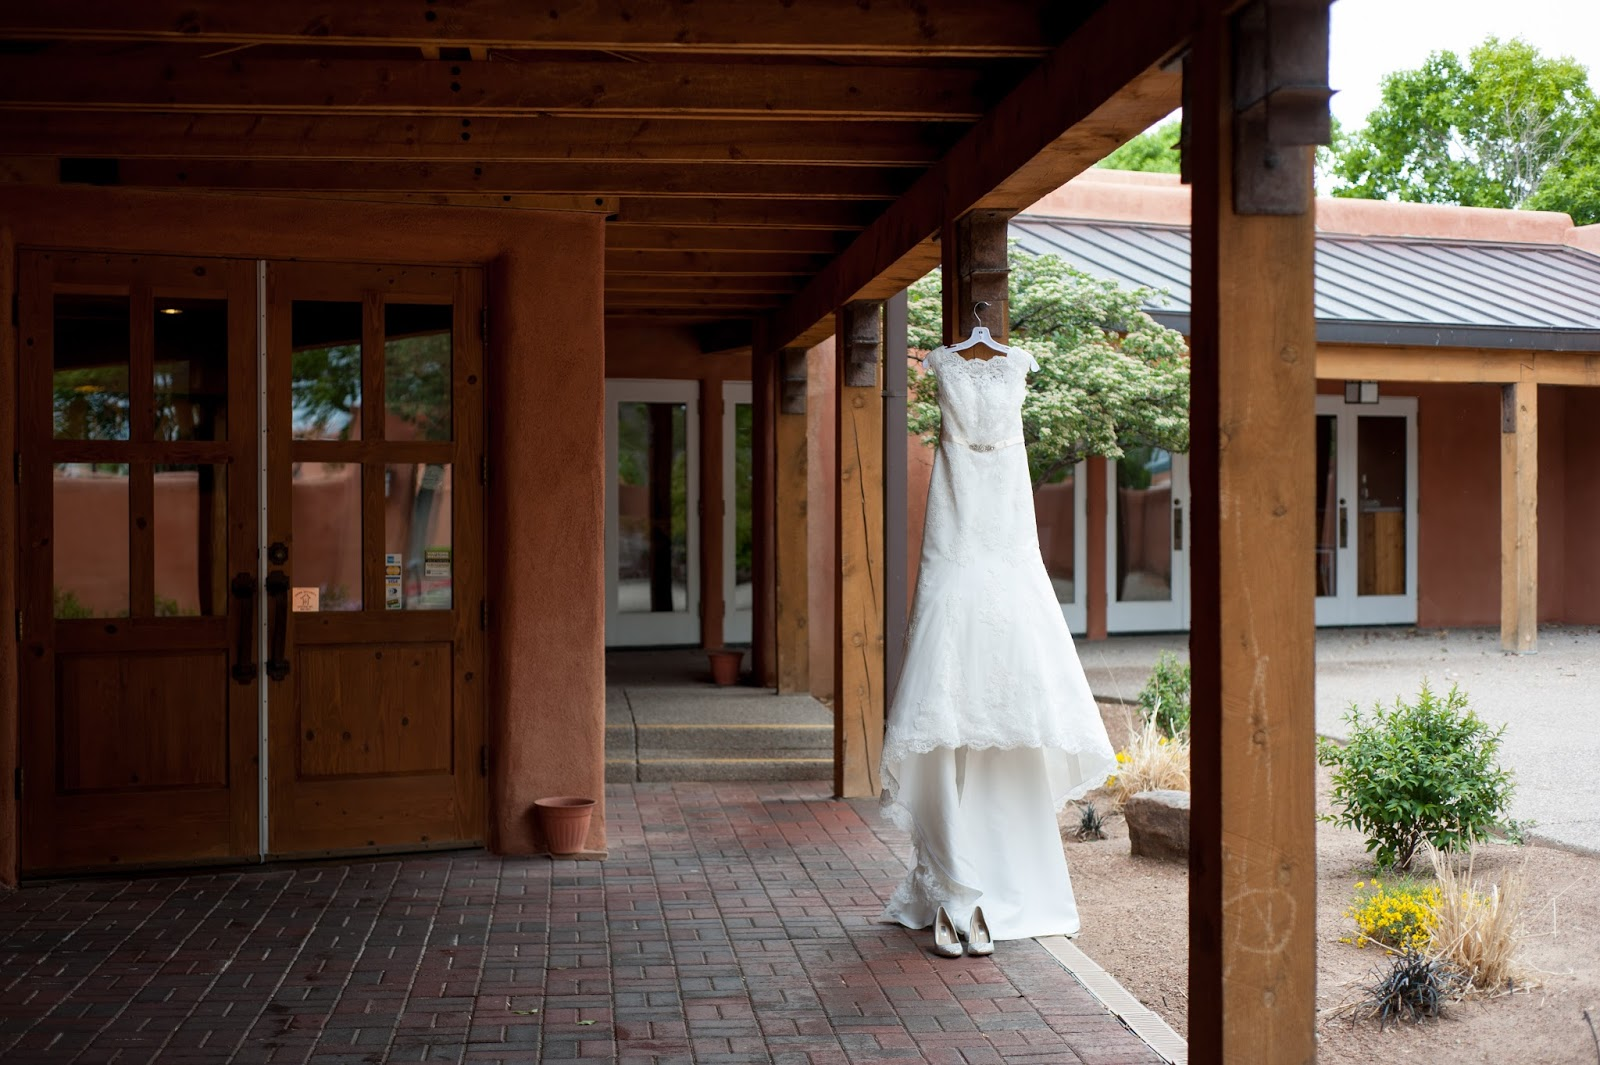 Maura scanlon wedding